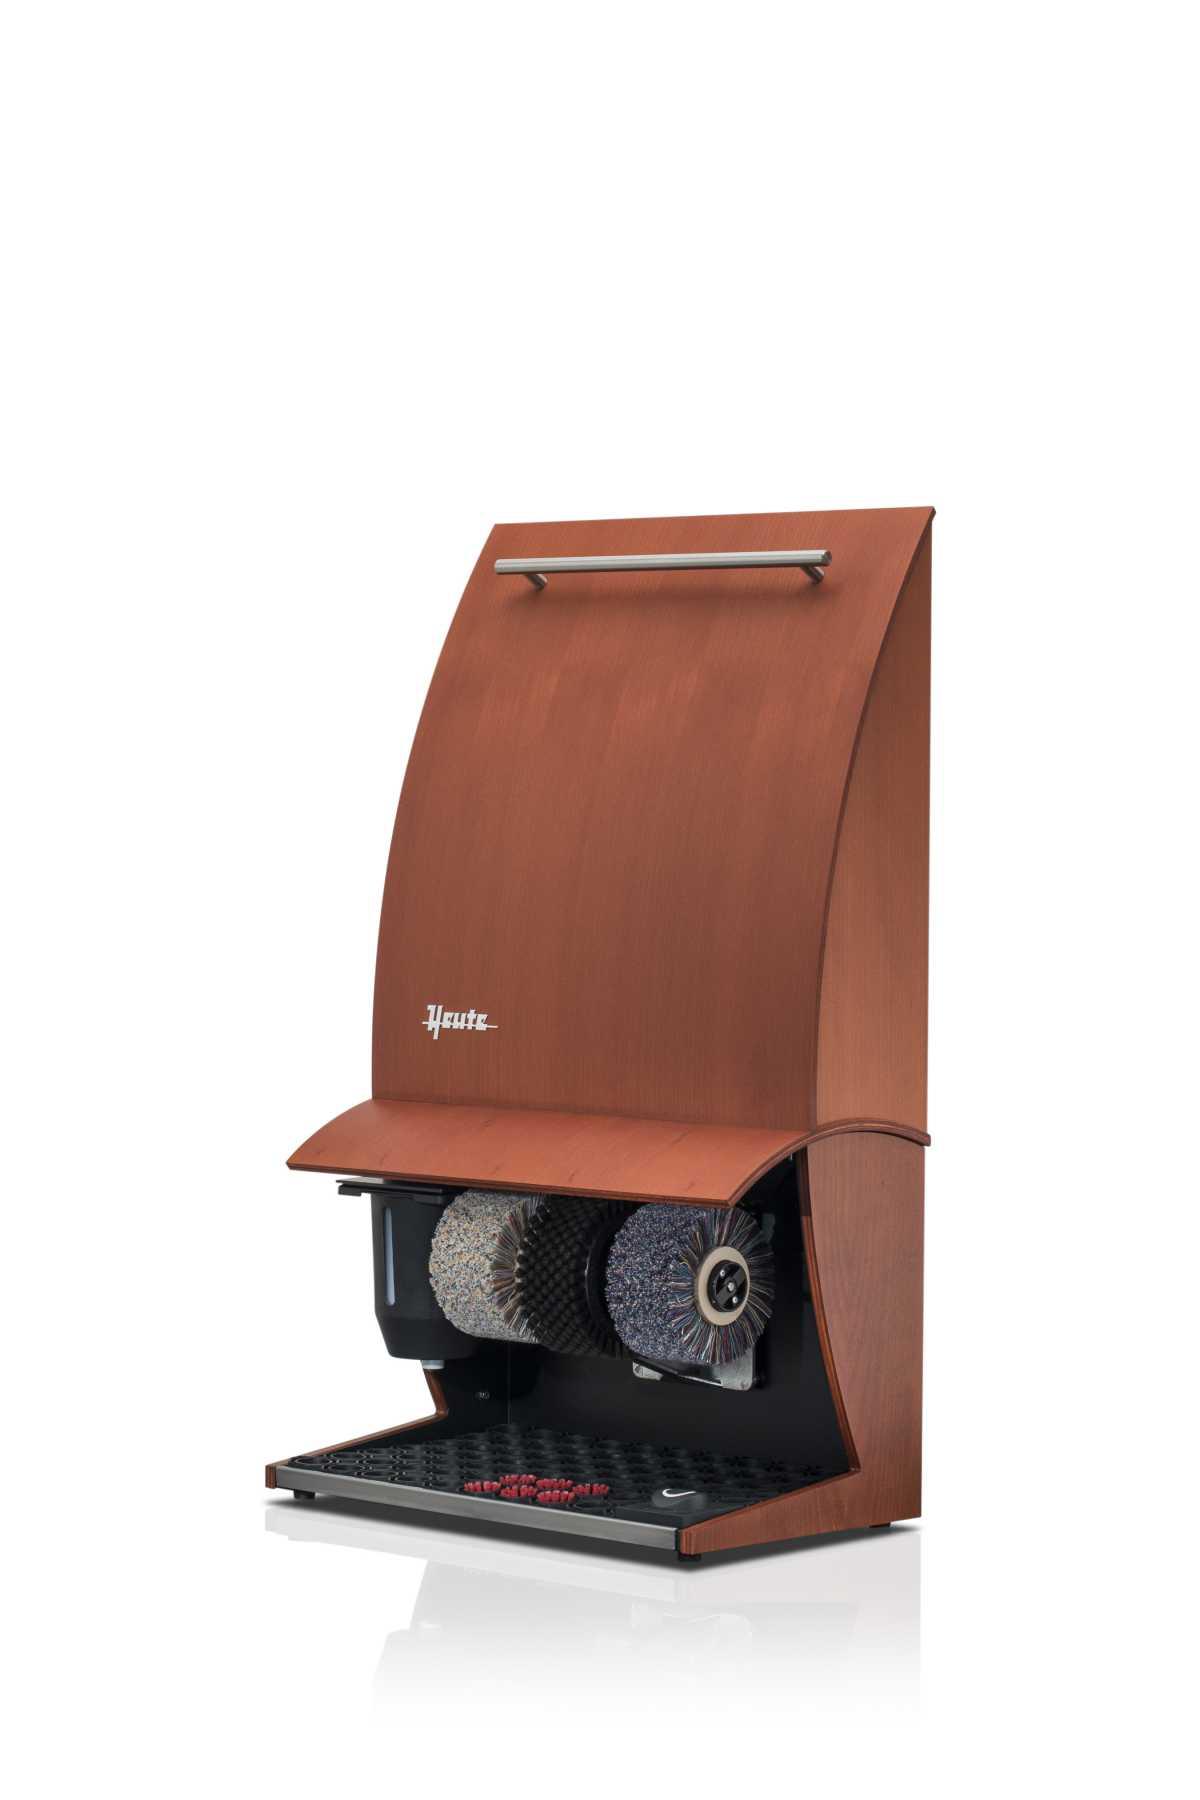 HEUTE Ayakkabı Cilalama Makinesi, Elégance Nature Plus